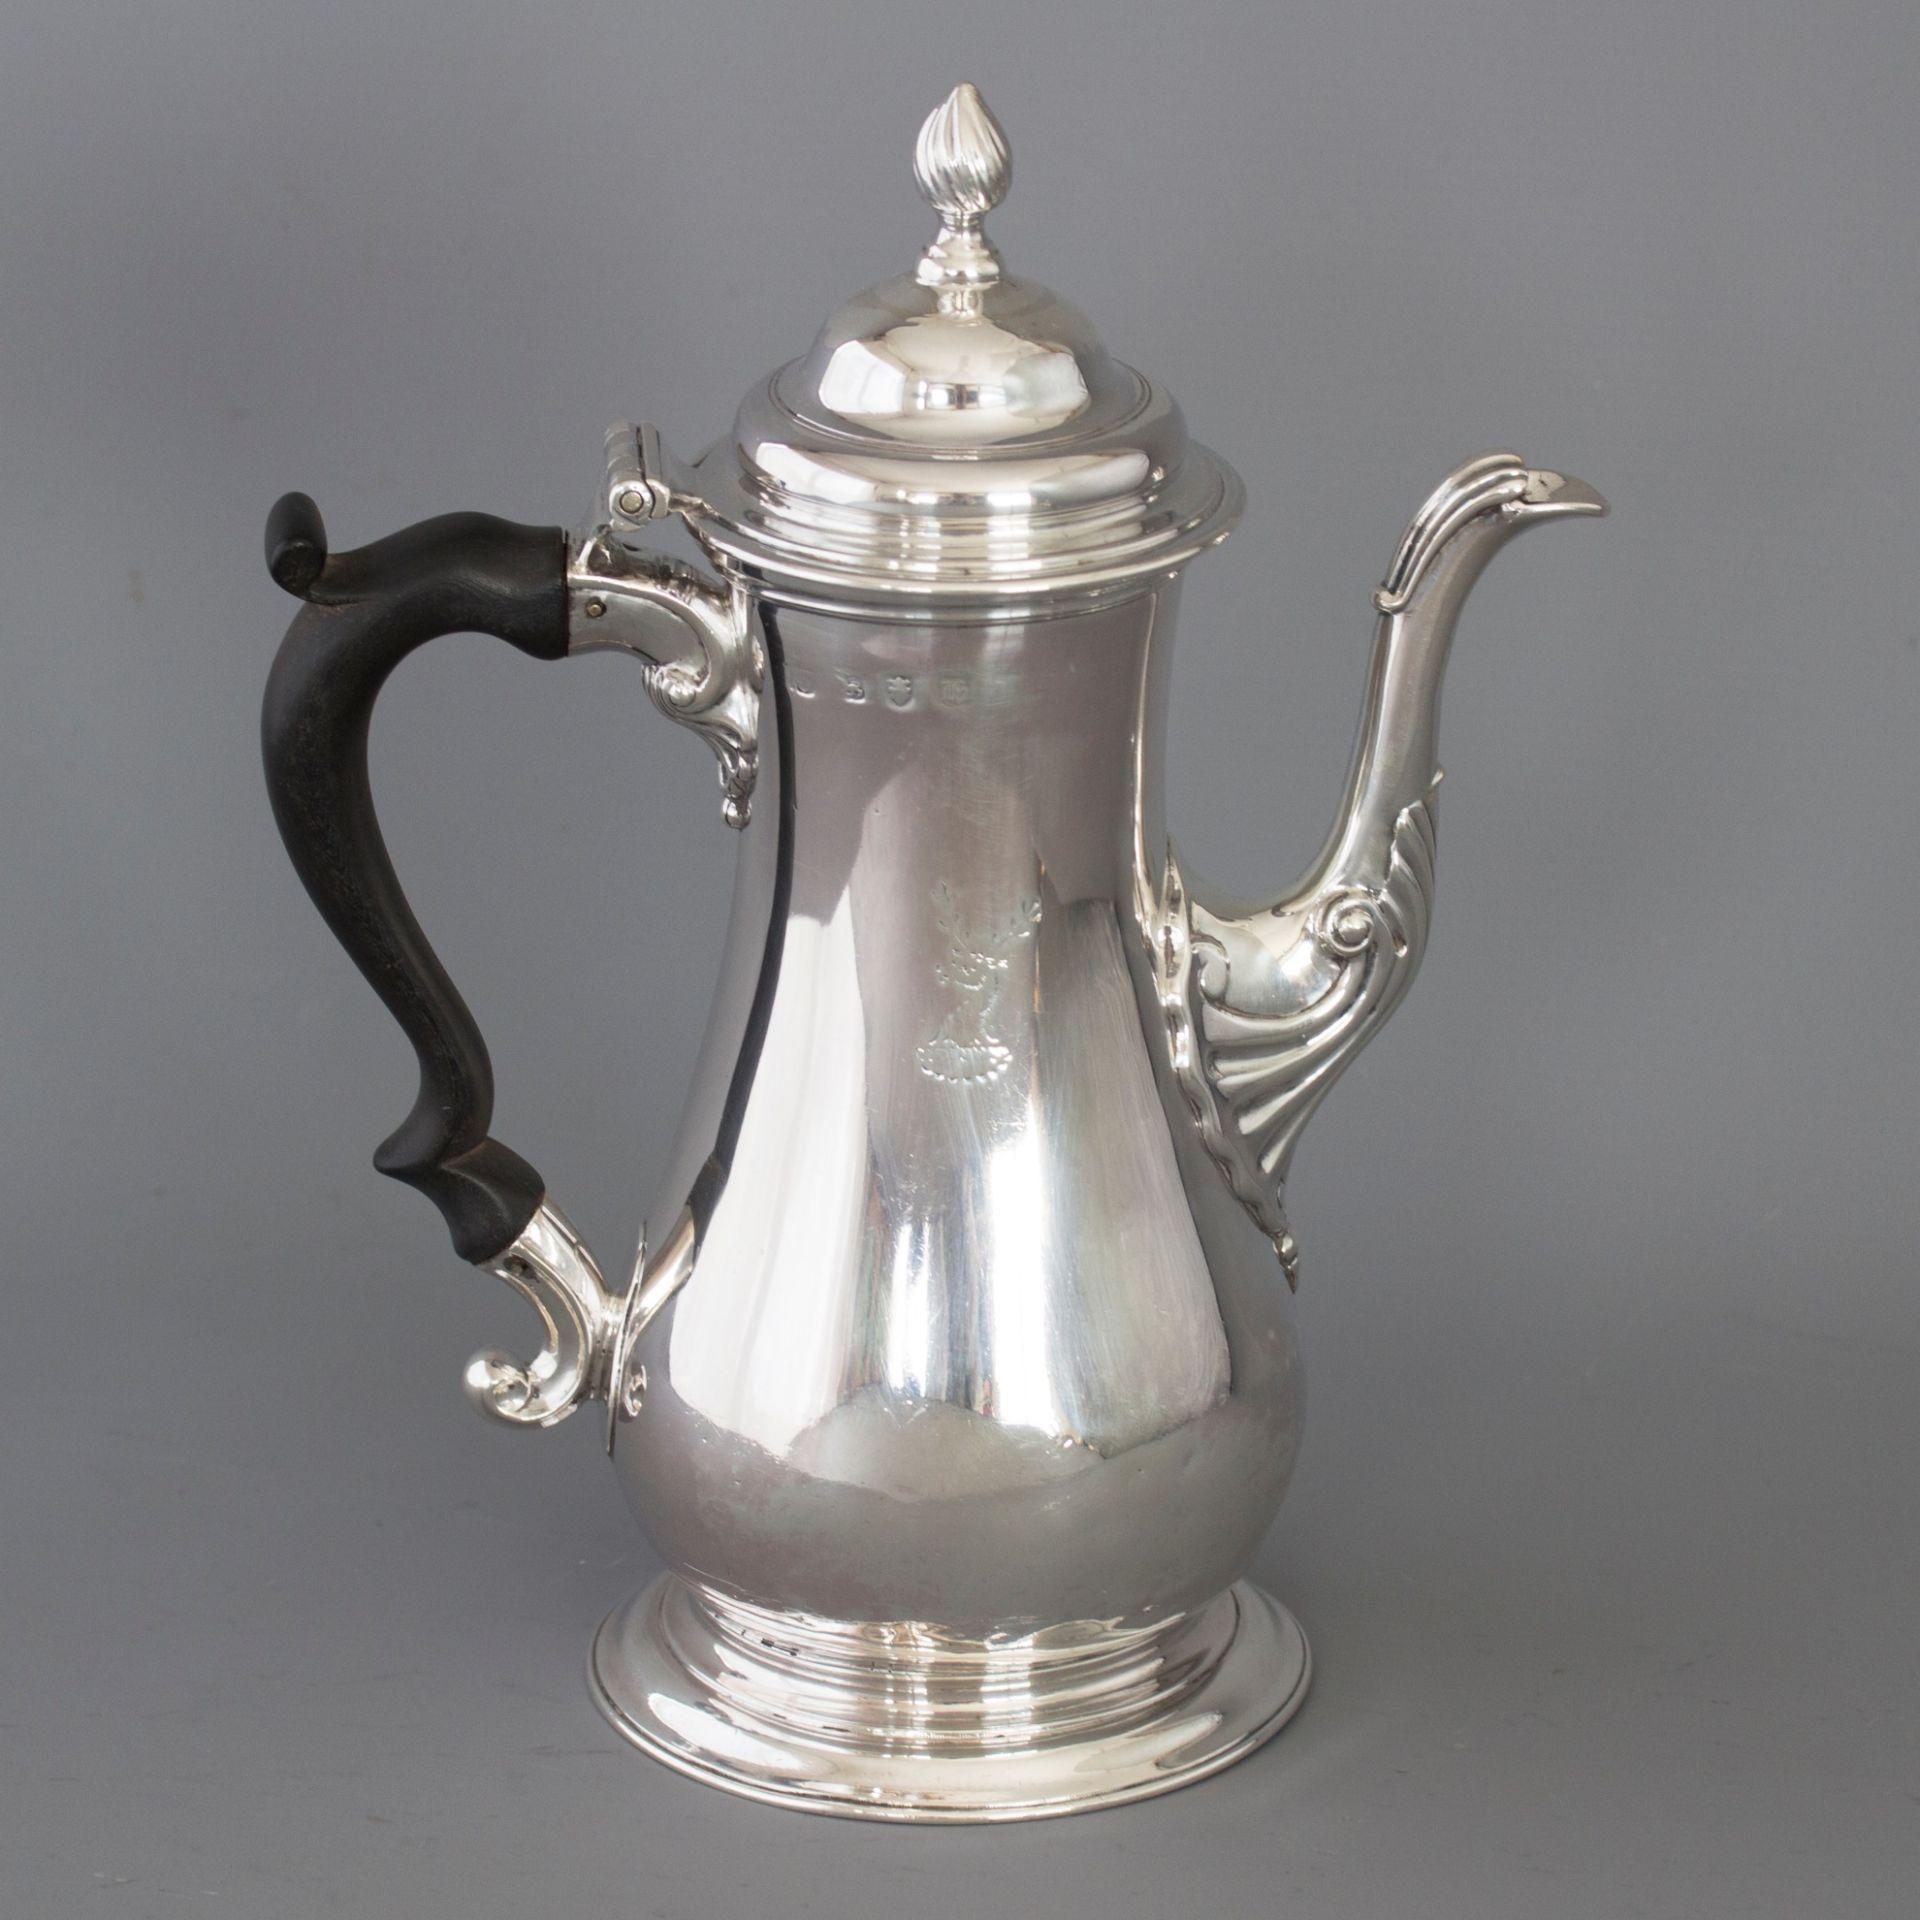 A George III Silver Coffee Pot London 1763 by William Grundy